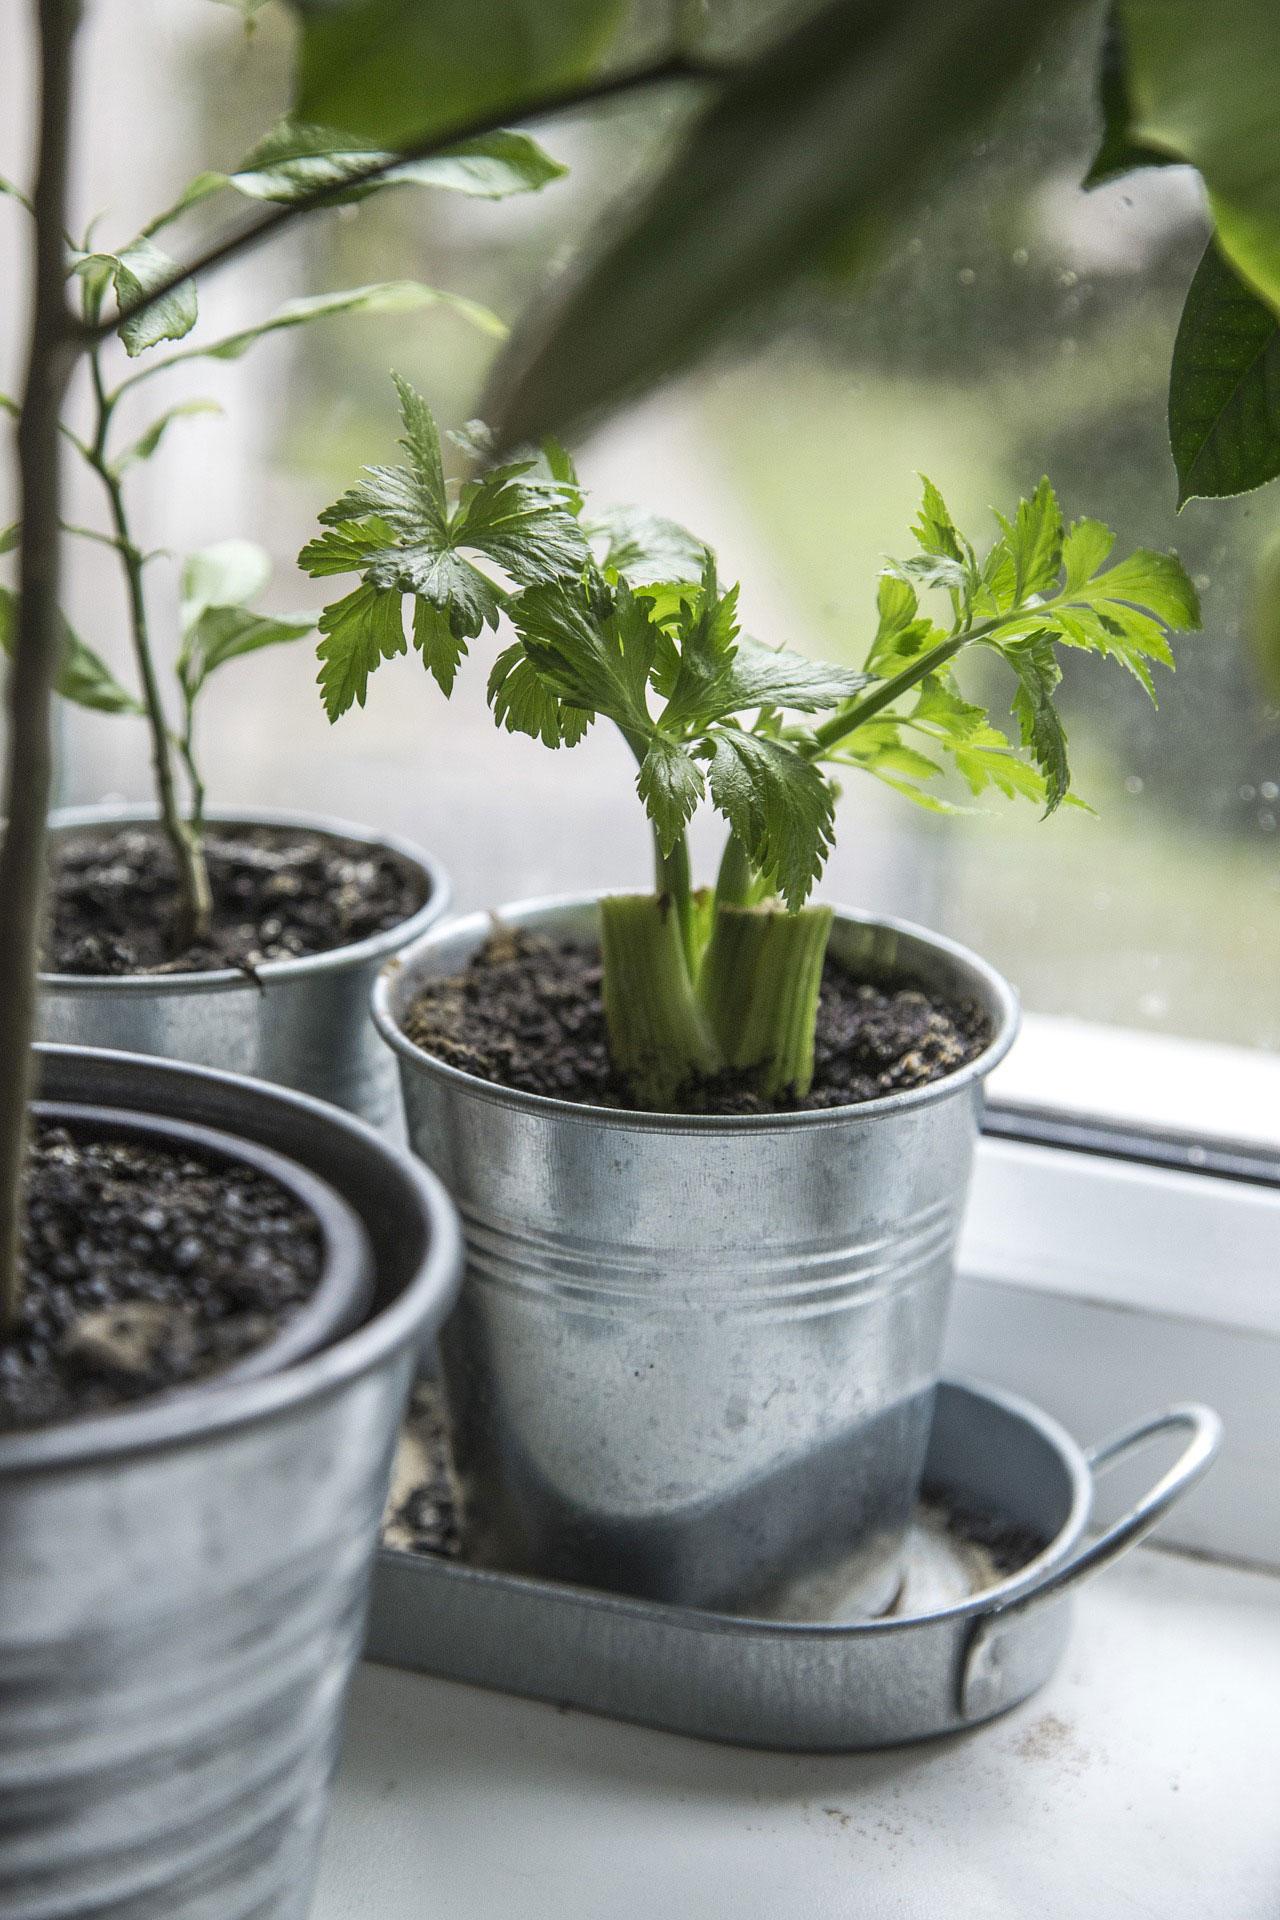 Window ledge herbs